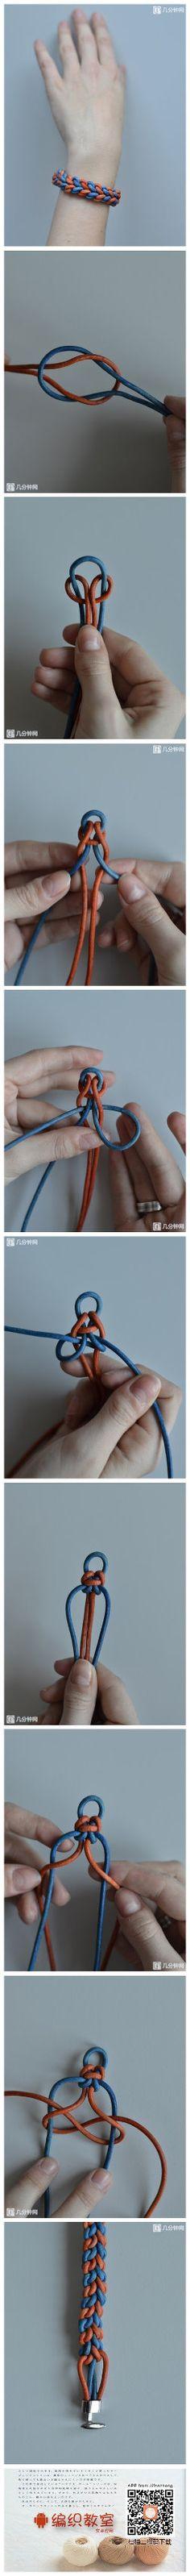 braid/ knot